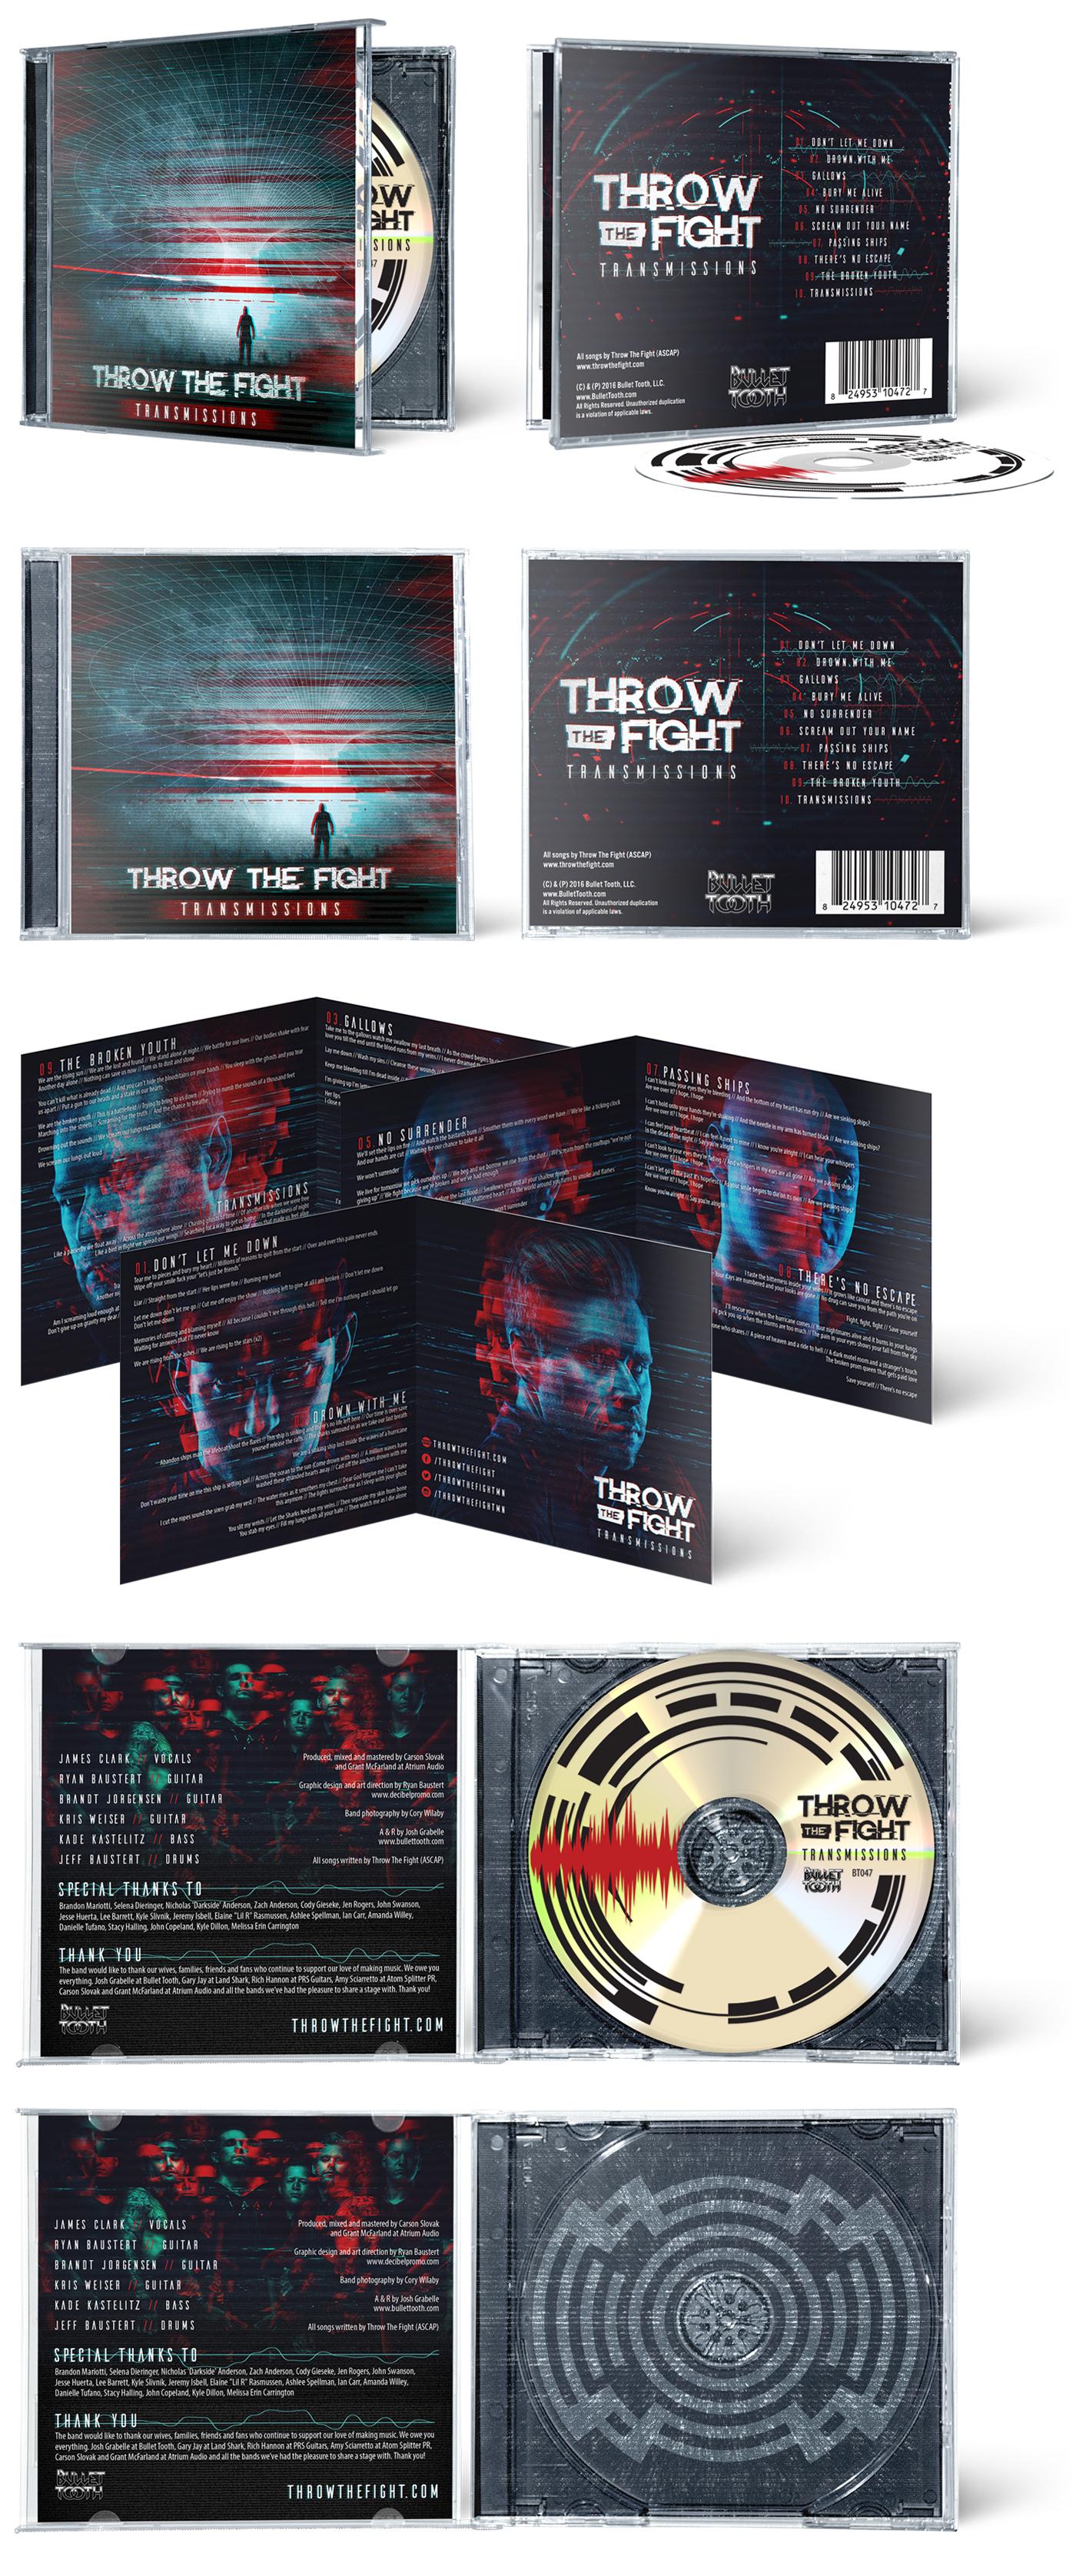 Throw The Fight Transmissions album artwork